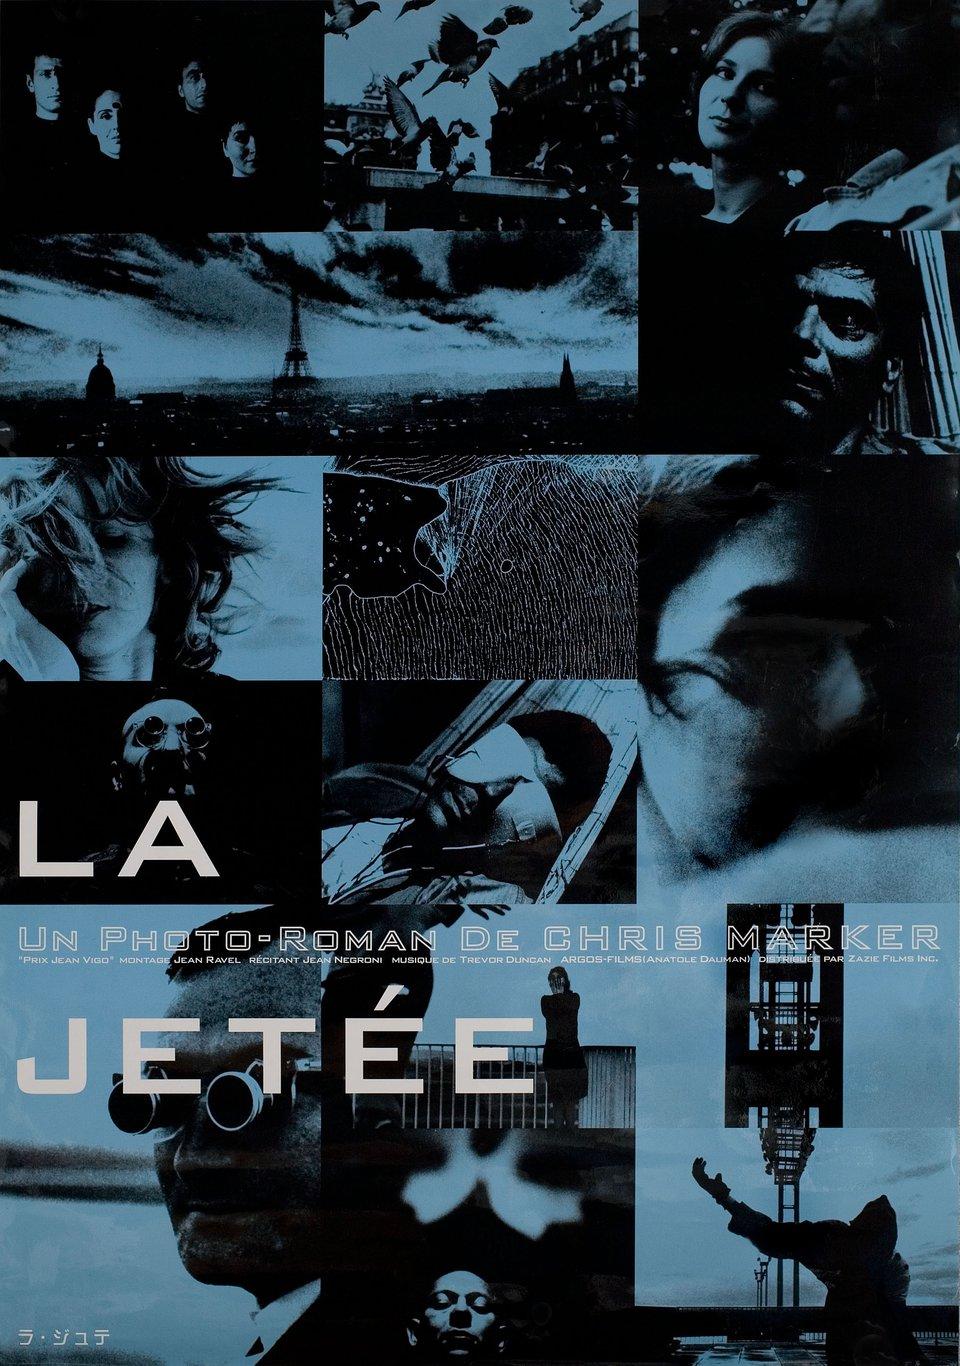 La Jetee 1999 Japanese B2 Poster